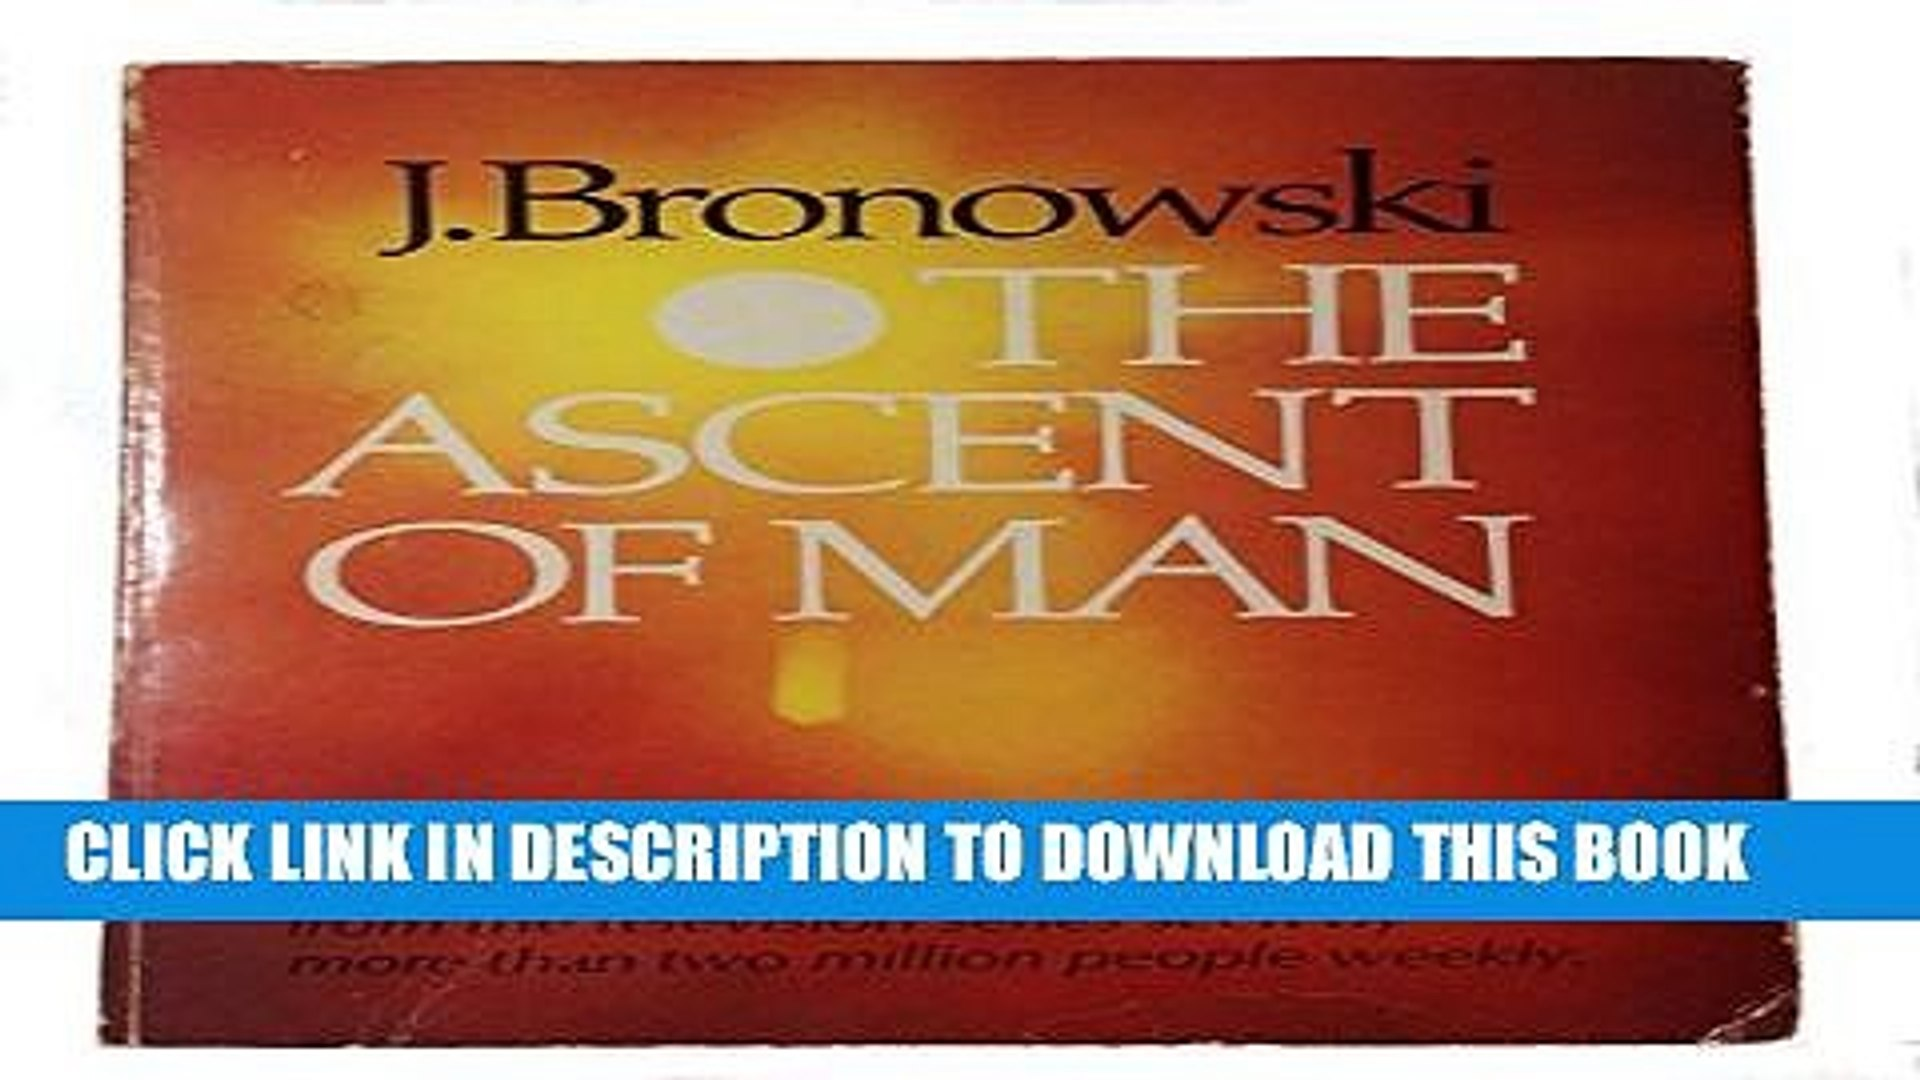 Bronowski Ascent Of Man Pdf